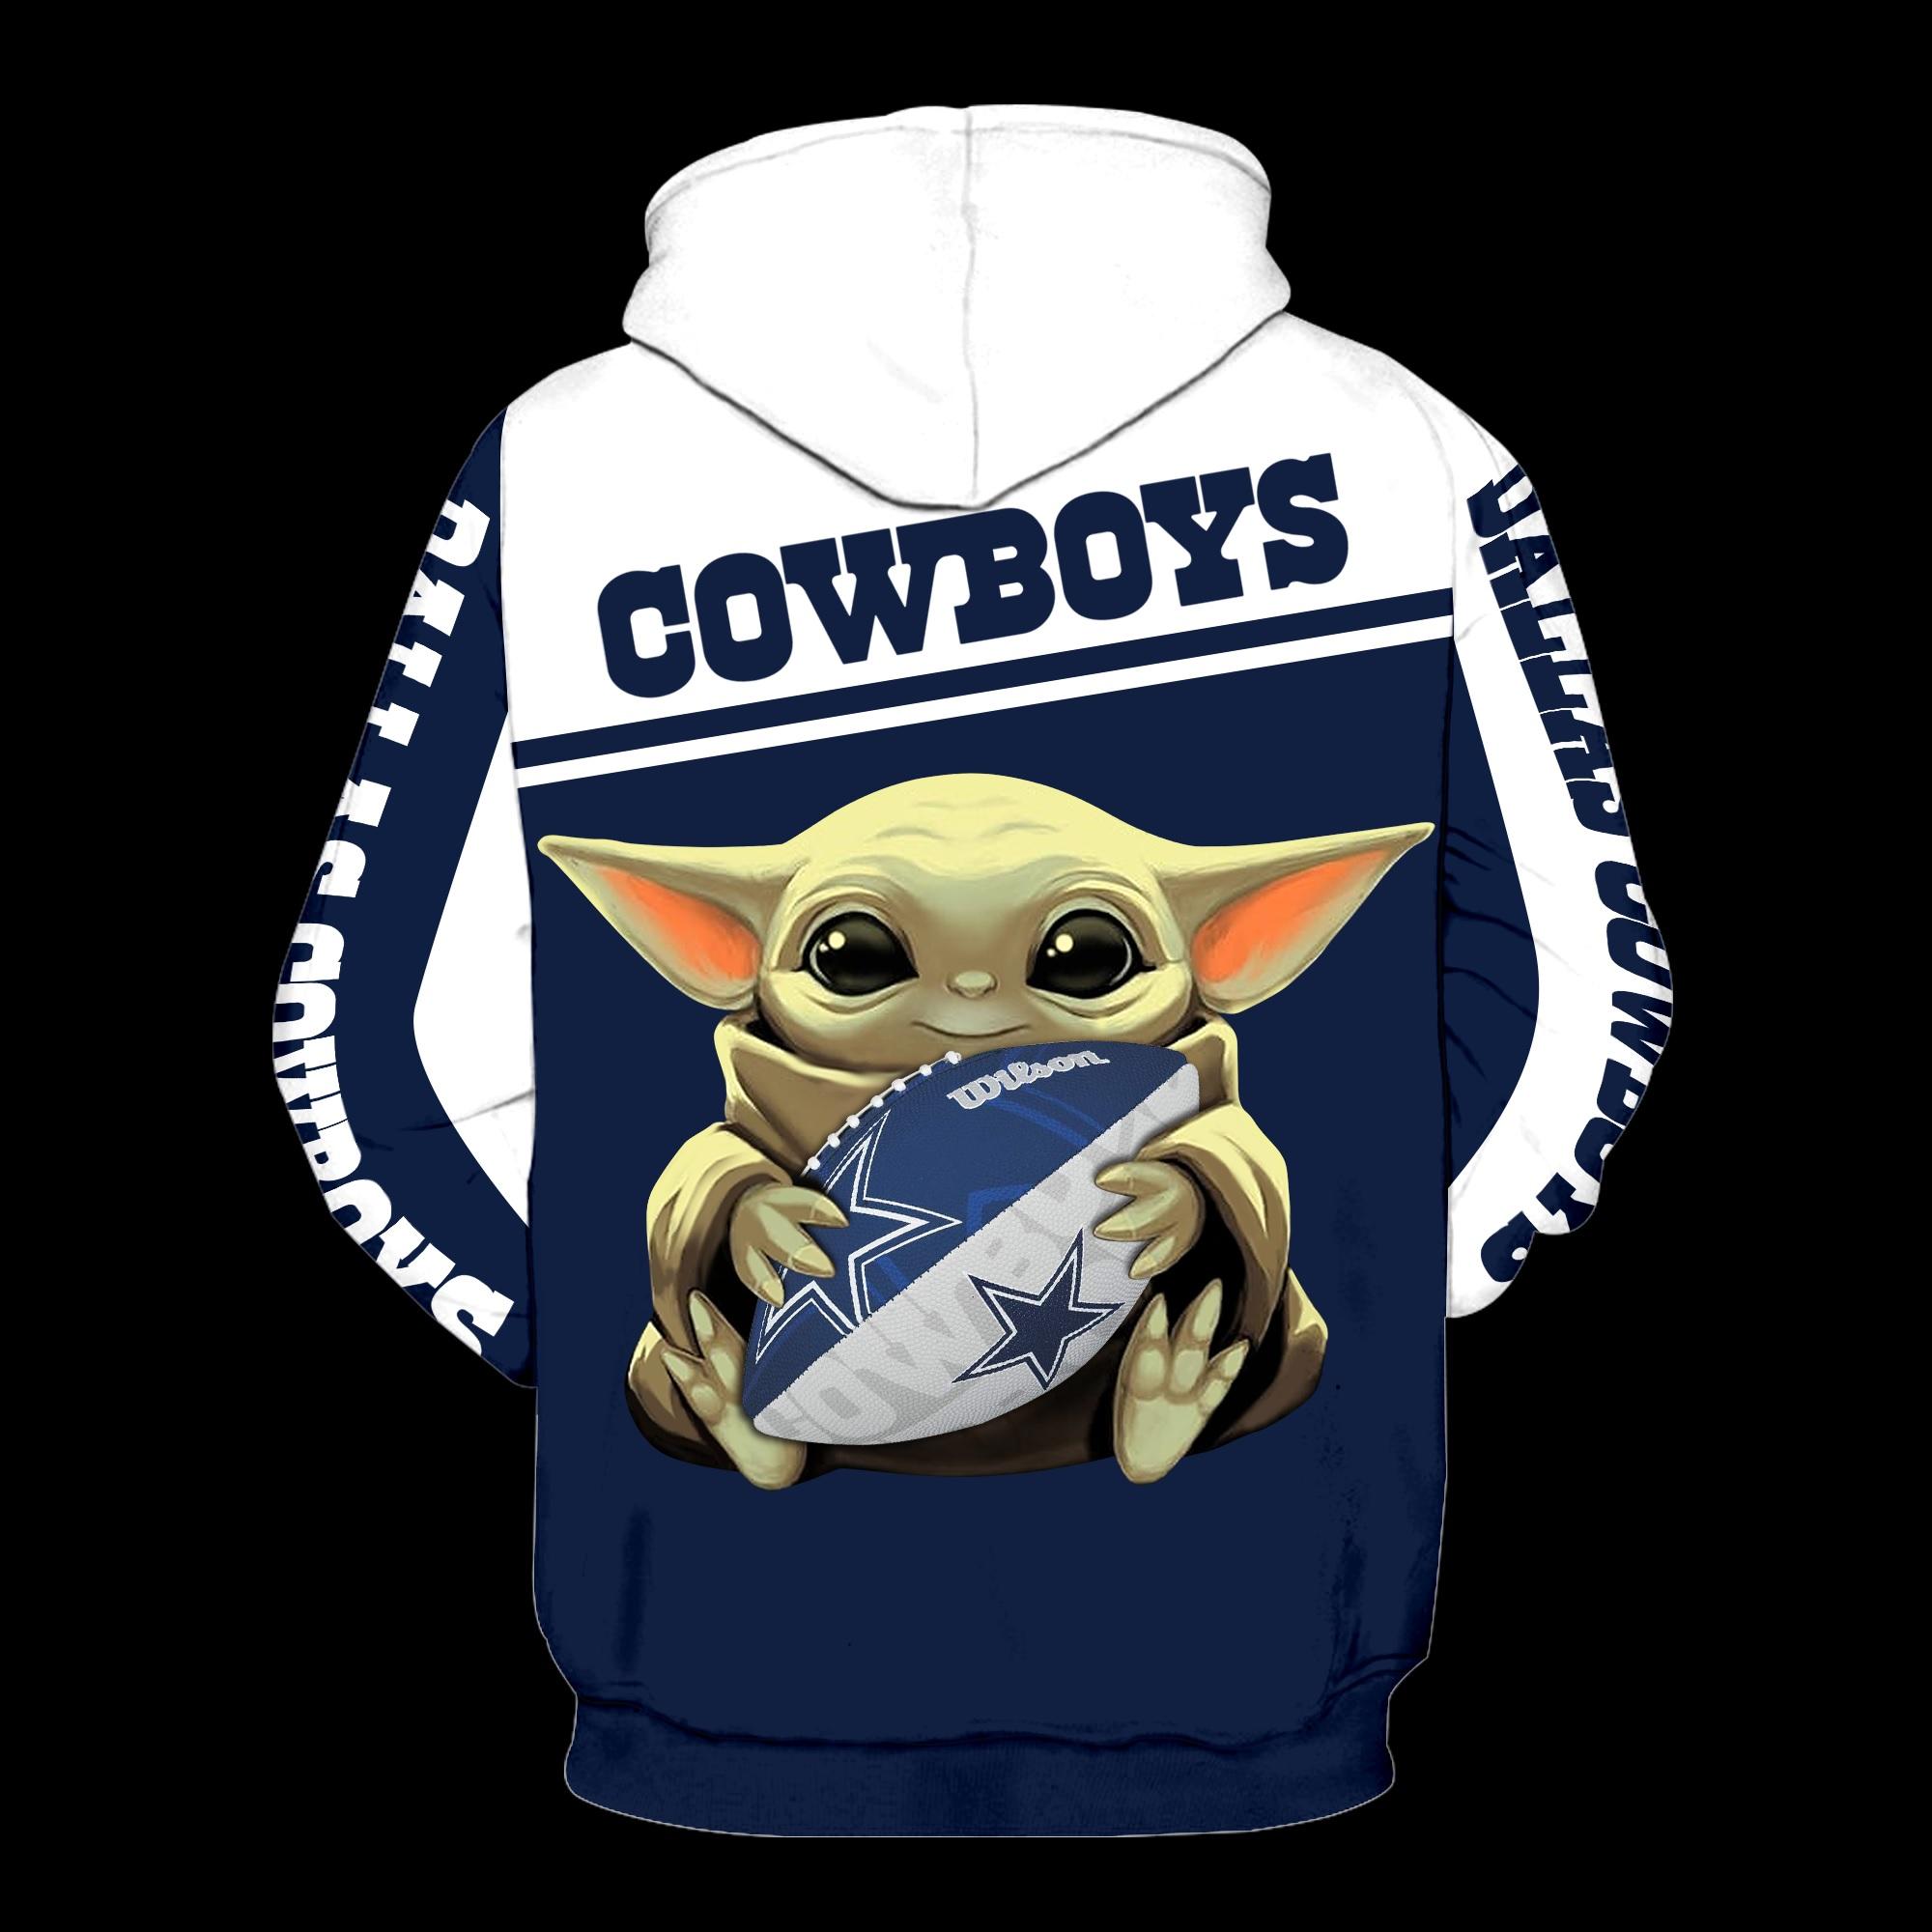 Dallas cowboys baby yoda all over print hoodie - back